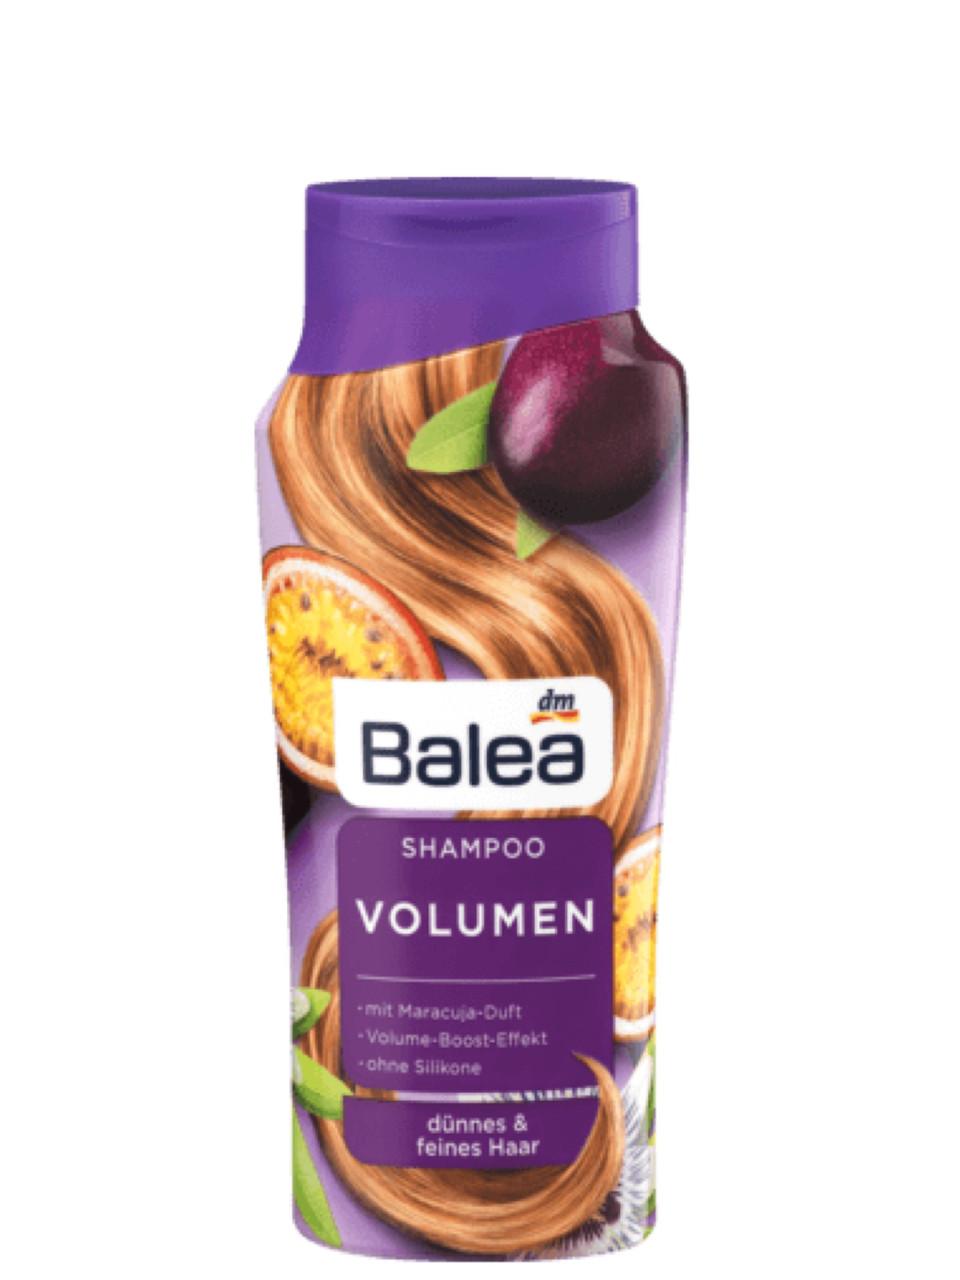 Шампунь Balea Shampoo Volumen для объема 300 мл